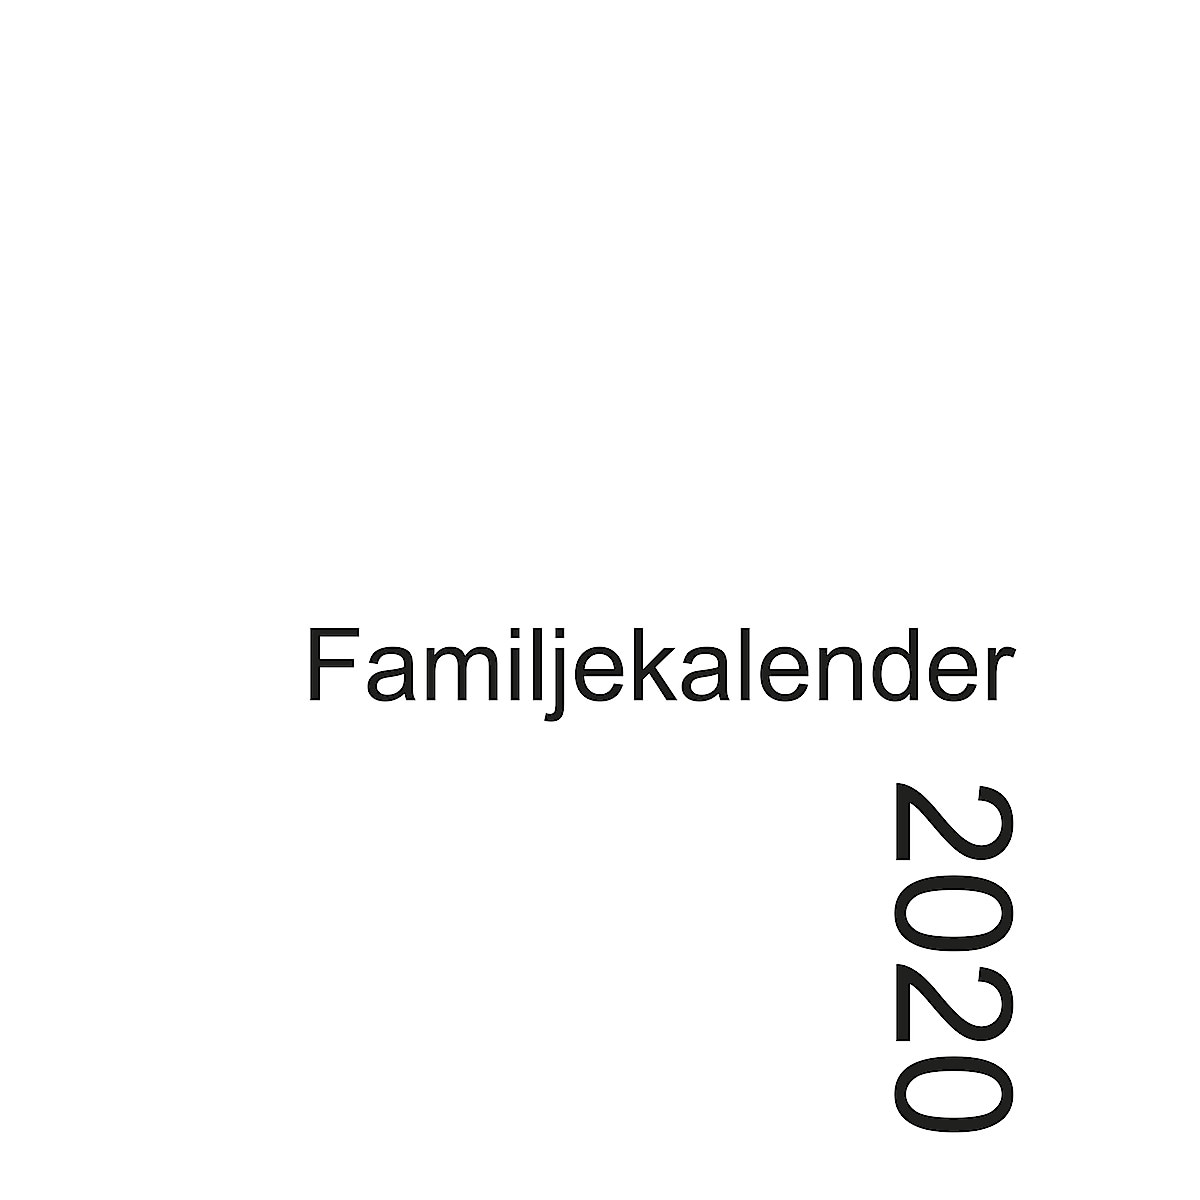 Familjekalender 2020, svenska